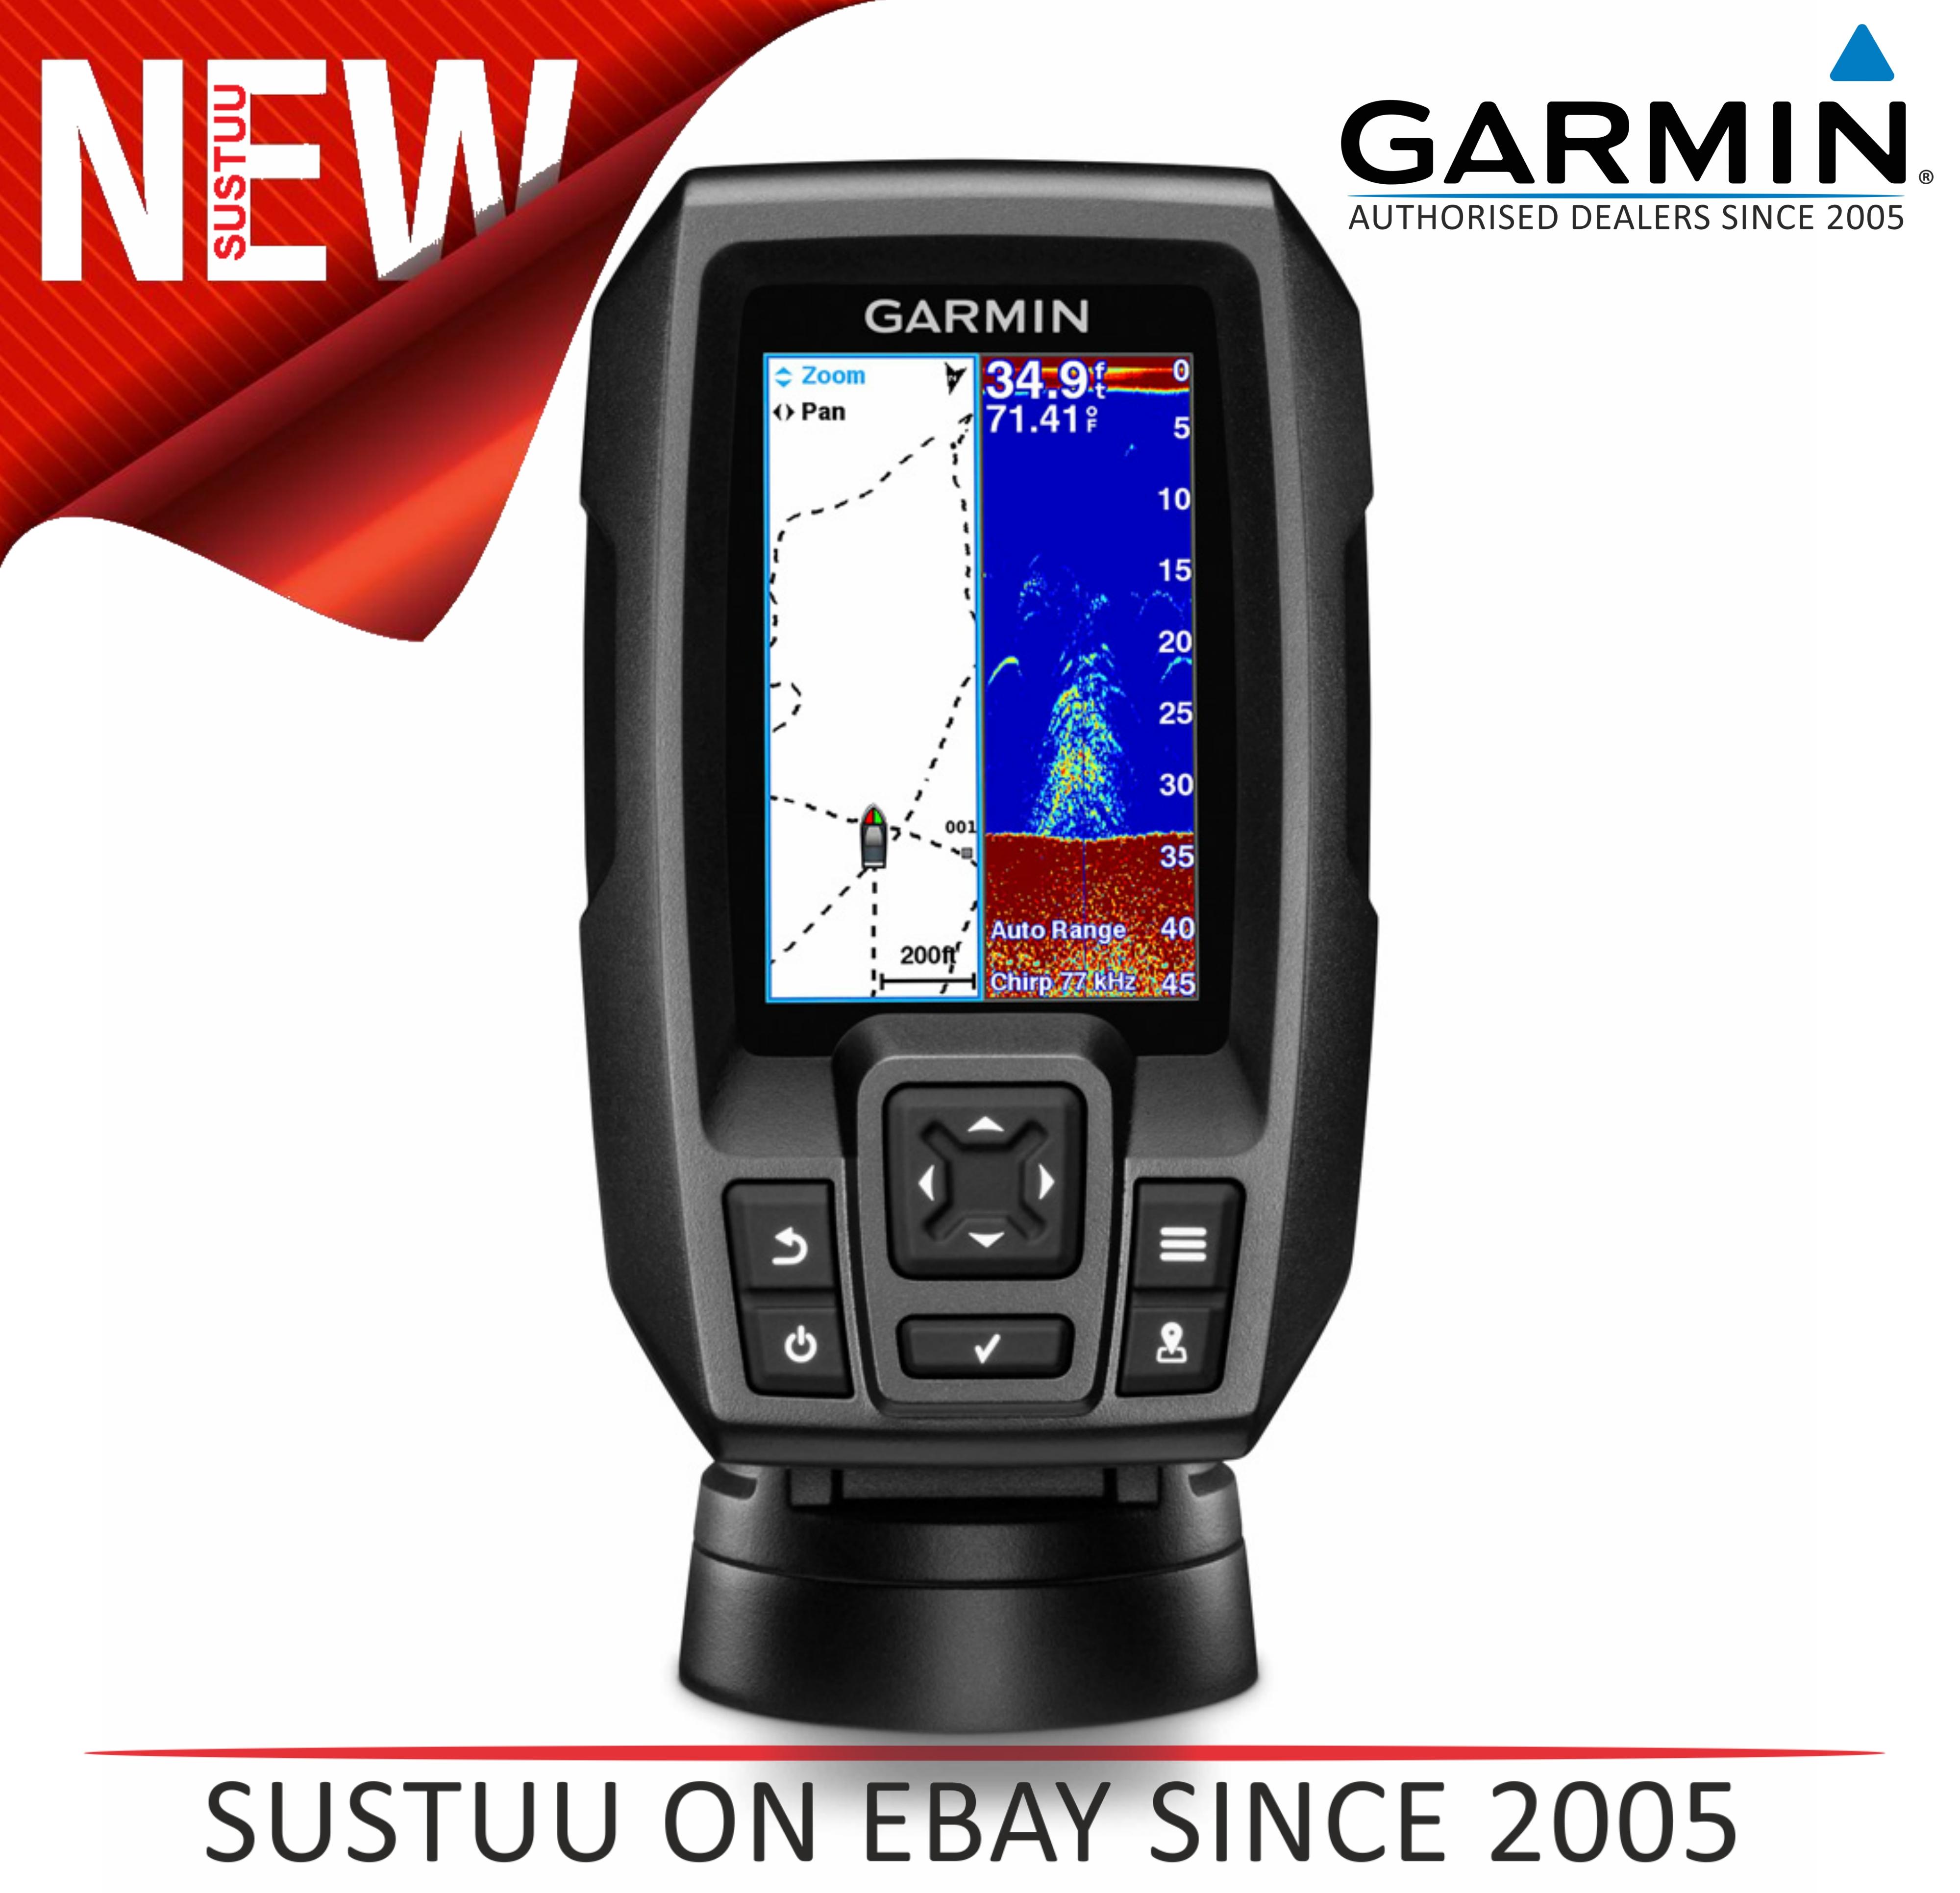 Garmin striker 4 3 5 sonar ww c w dual beam tm txd for Garmin striker 4 ice fishing